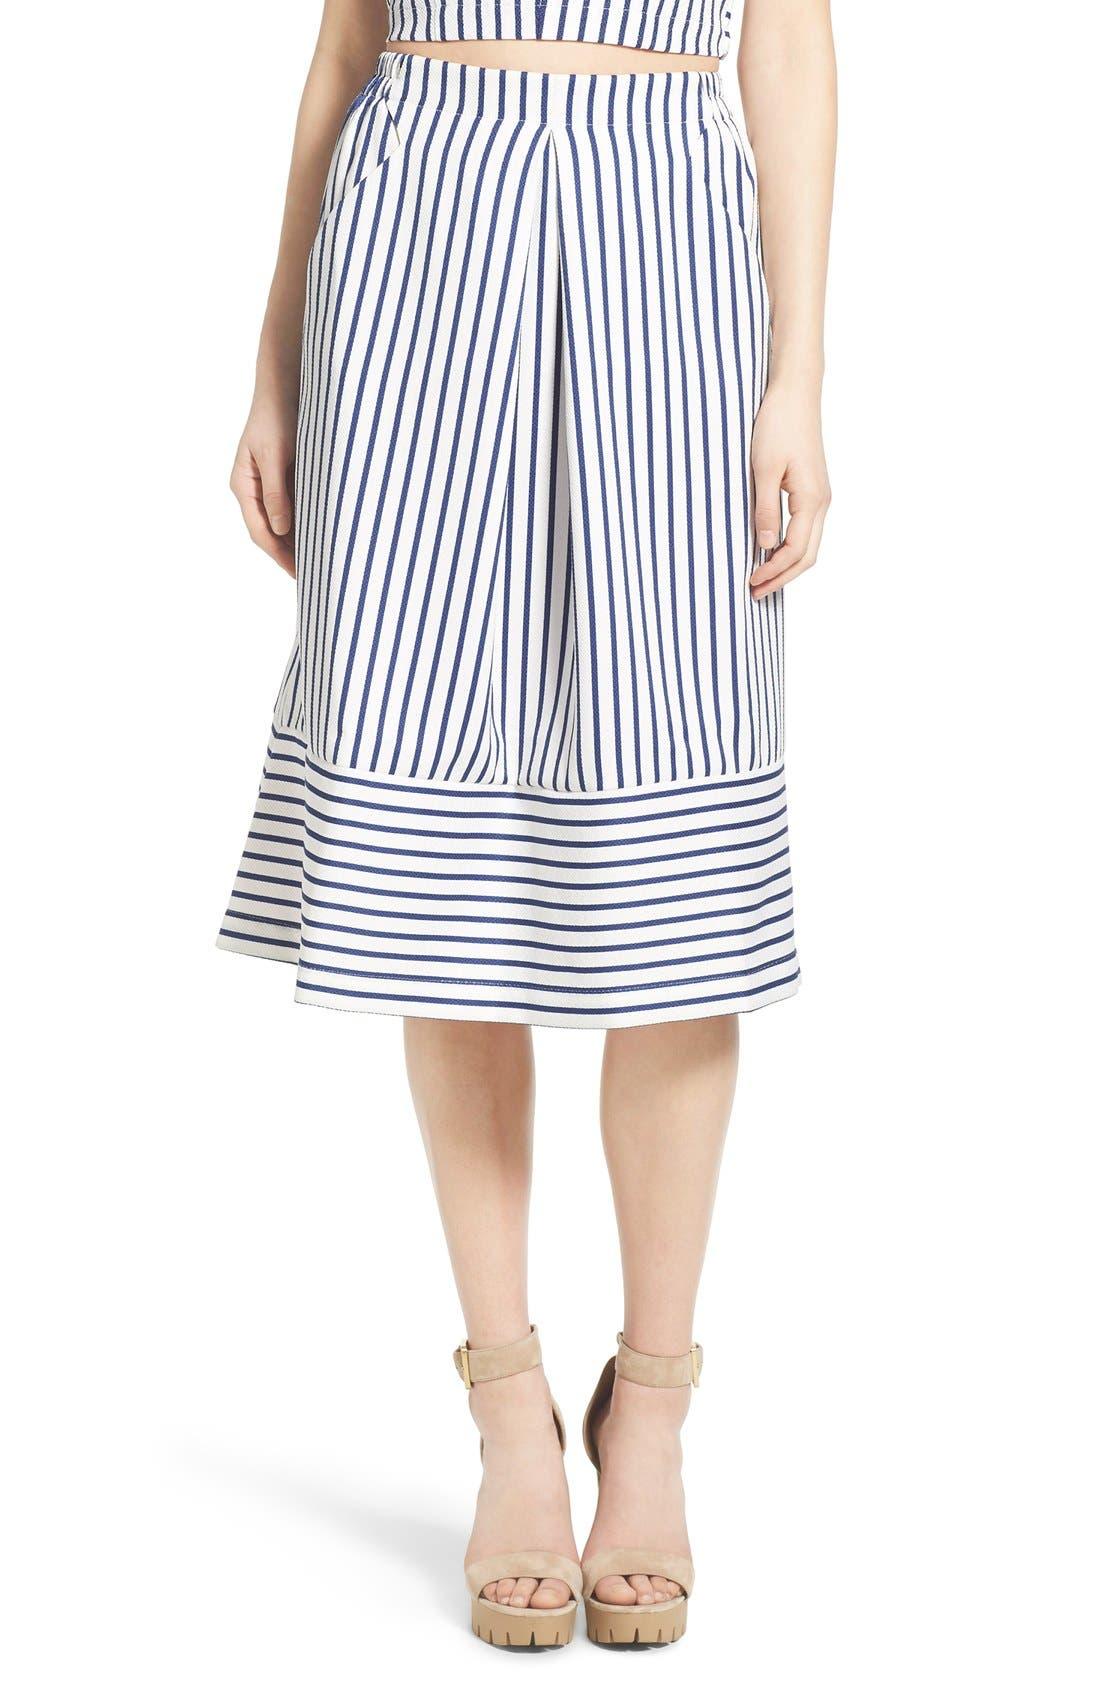 Alternate Image 1 Selected - J.O.A. Cotton Poplin Stripe Midi Skirt